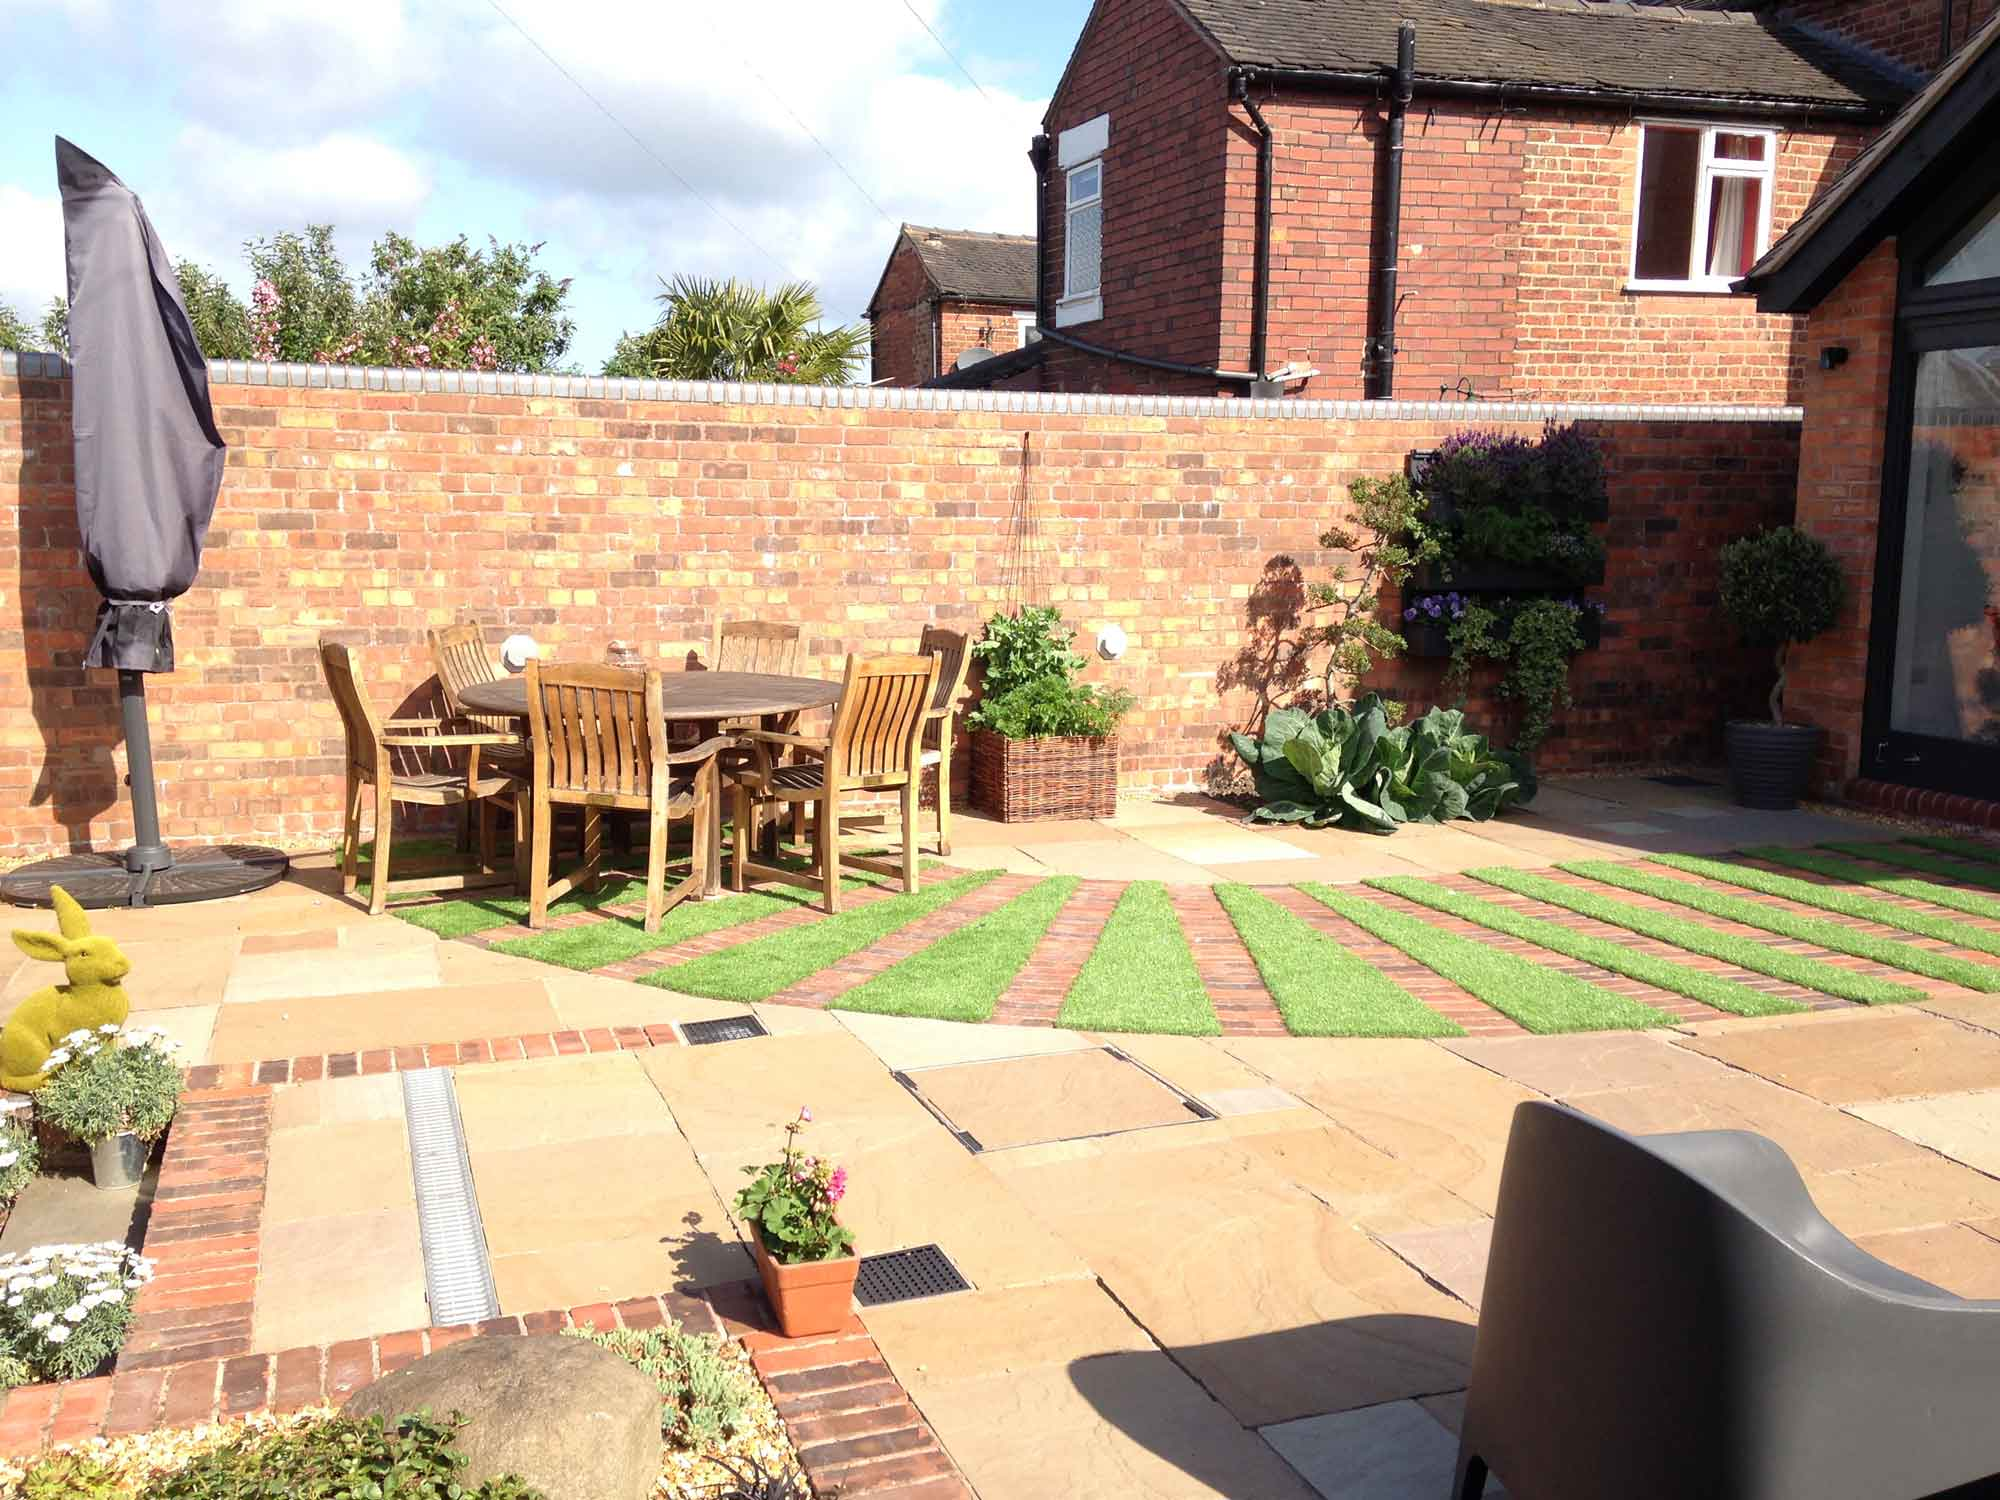 garden terrace astro turf Indian stone paving